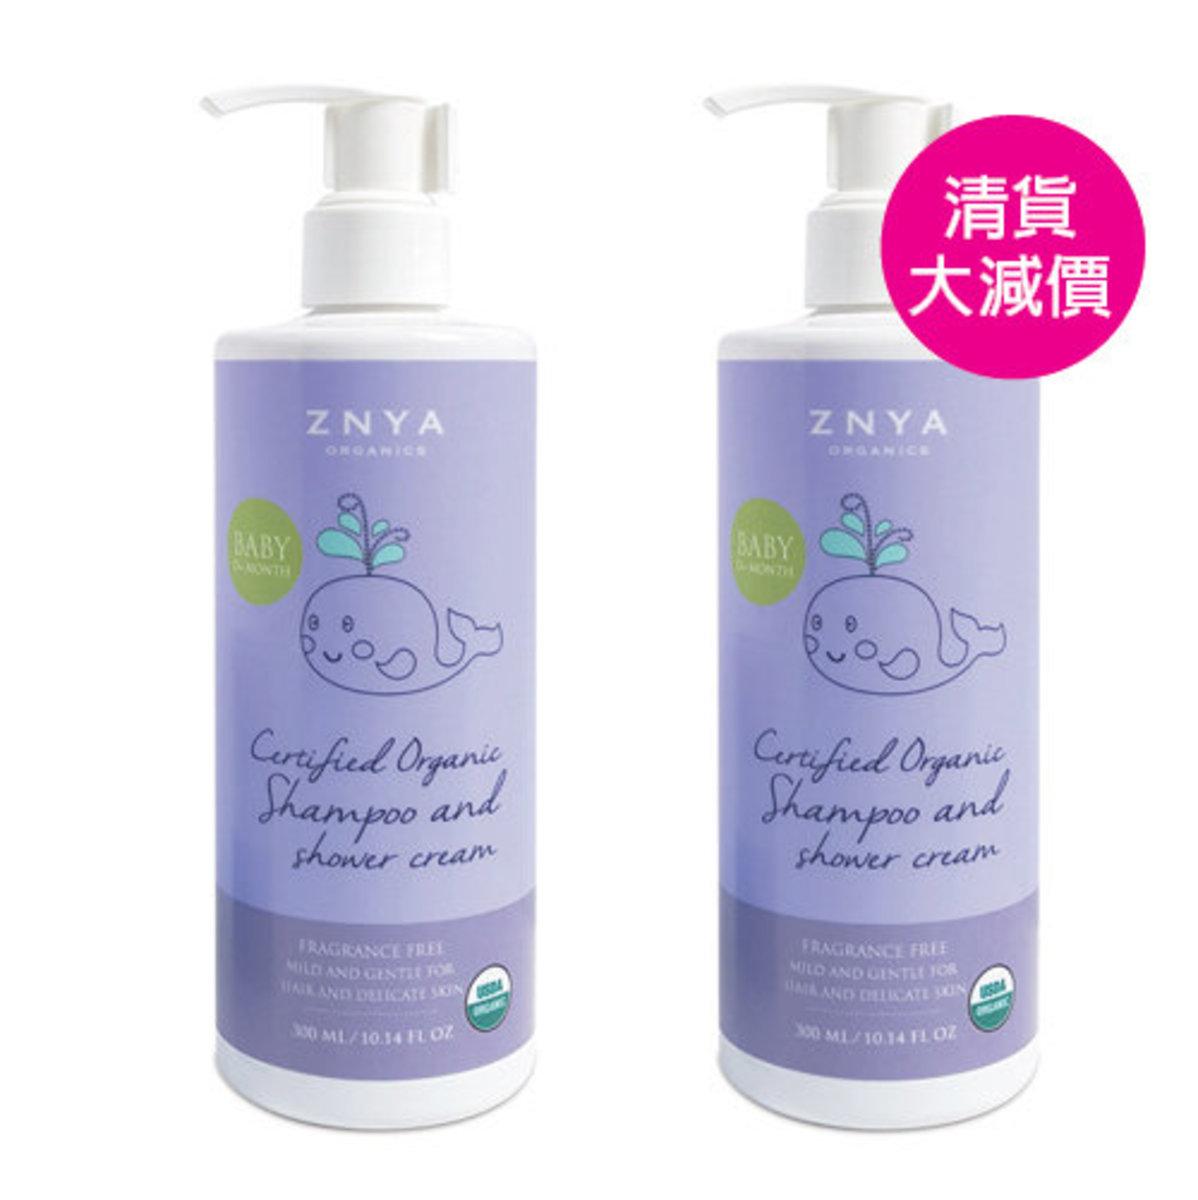 USDA Organic Baby Shampoo and Shower (2 Bottles) [Best Before: 05/2020]